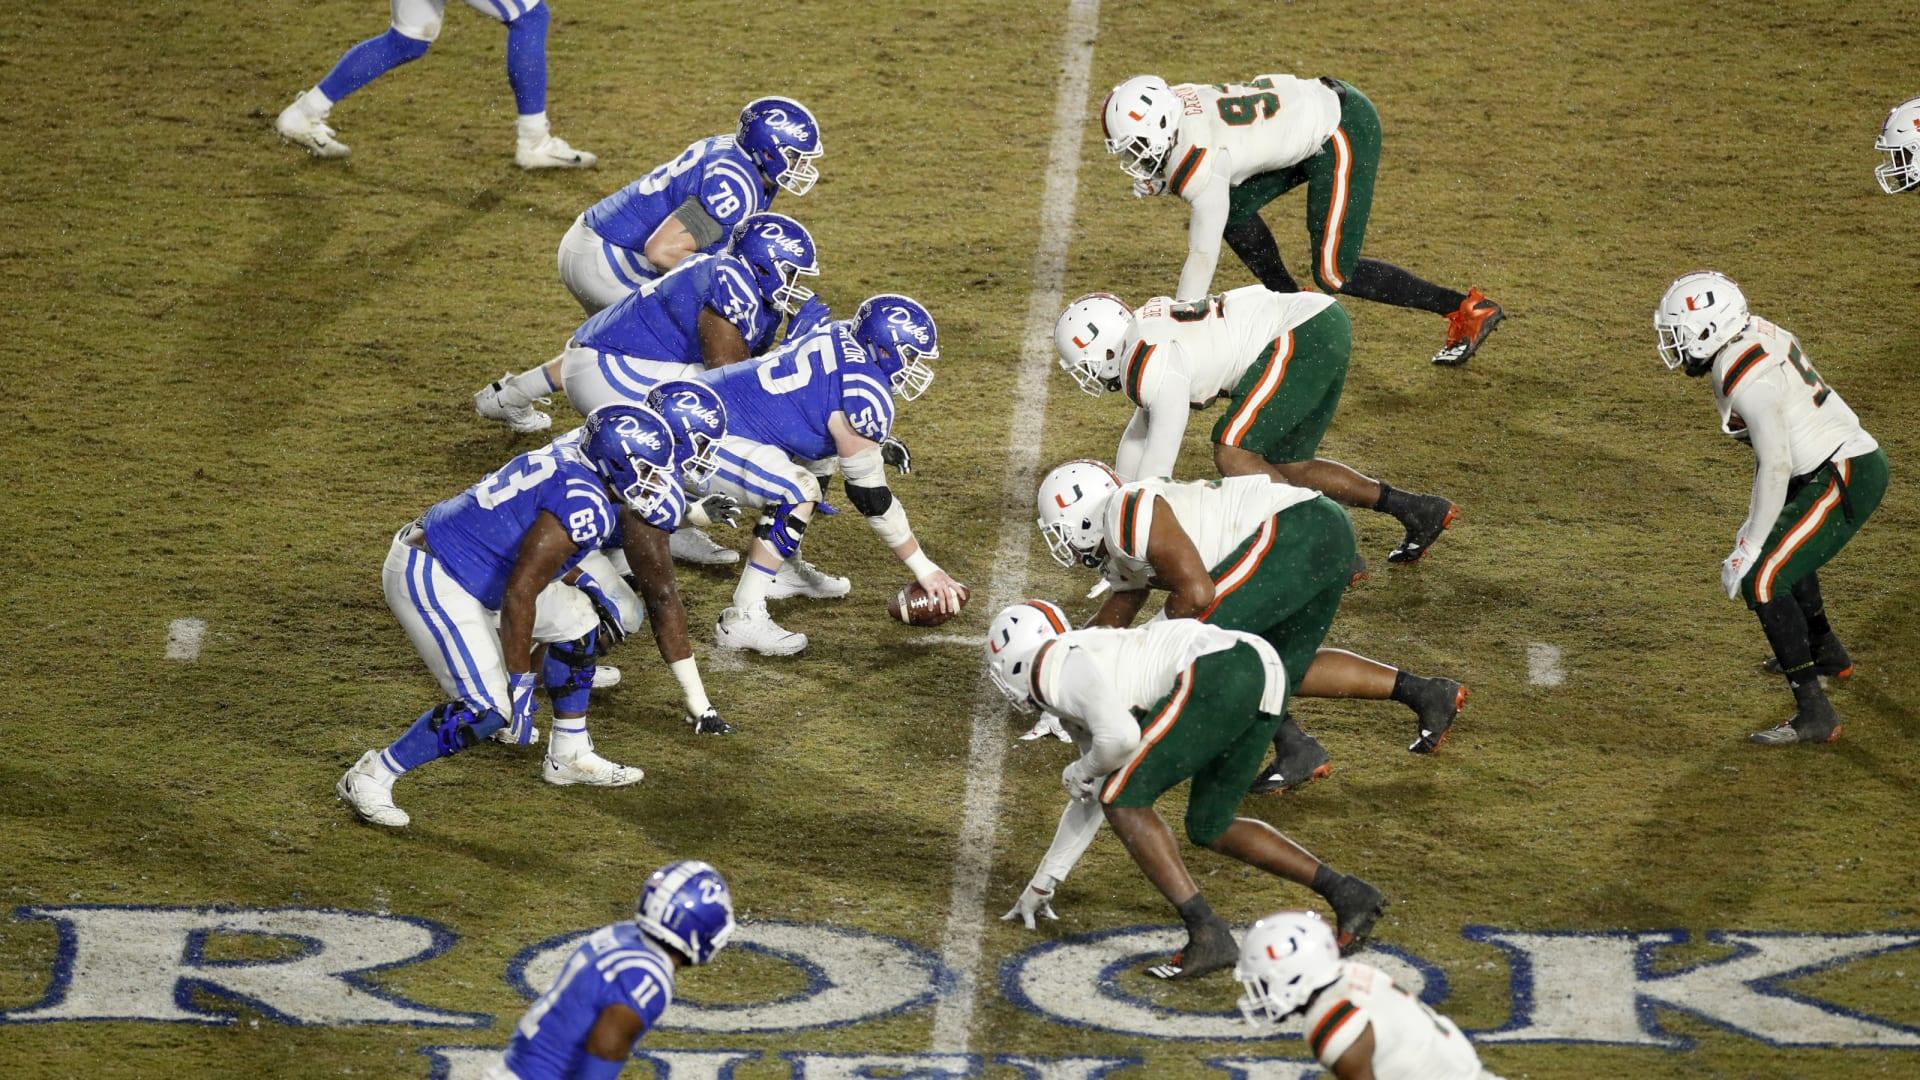 Duke football makes Top-10 for Class of 2021 offensive lineman 'Big Crim'